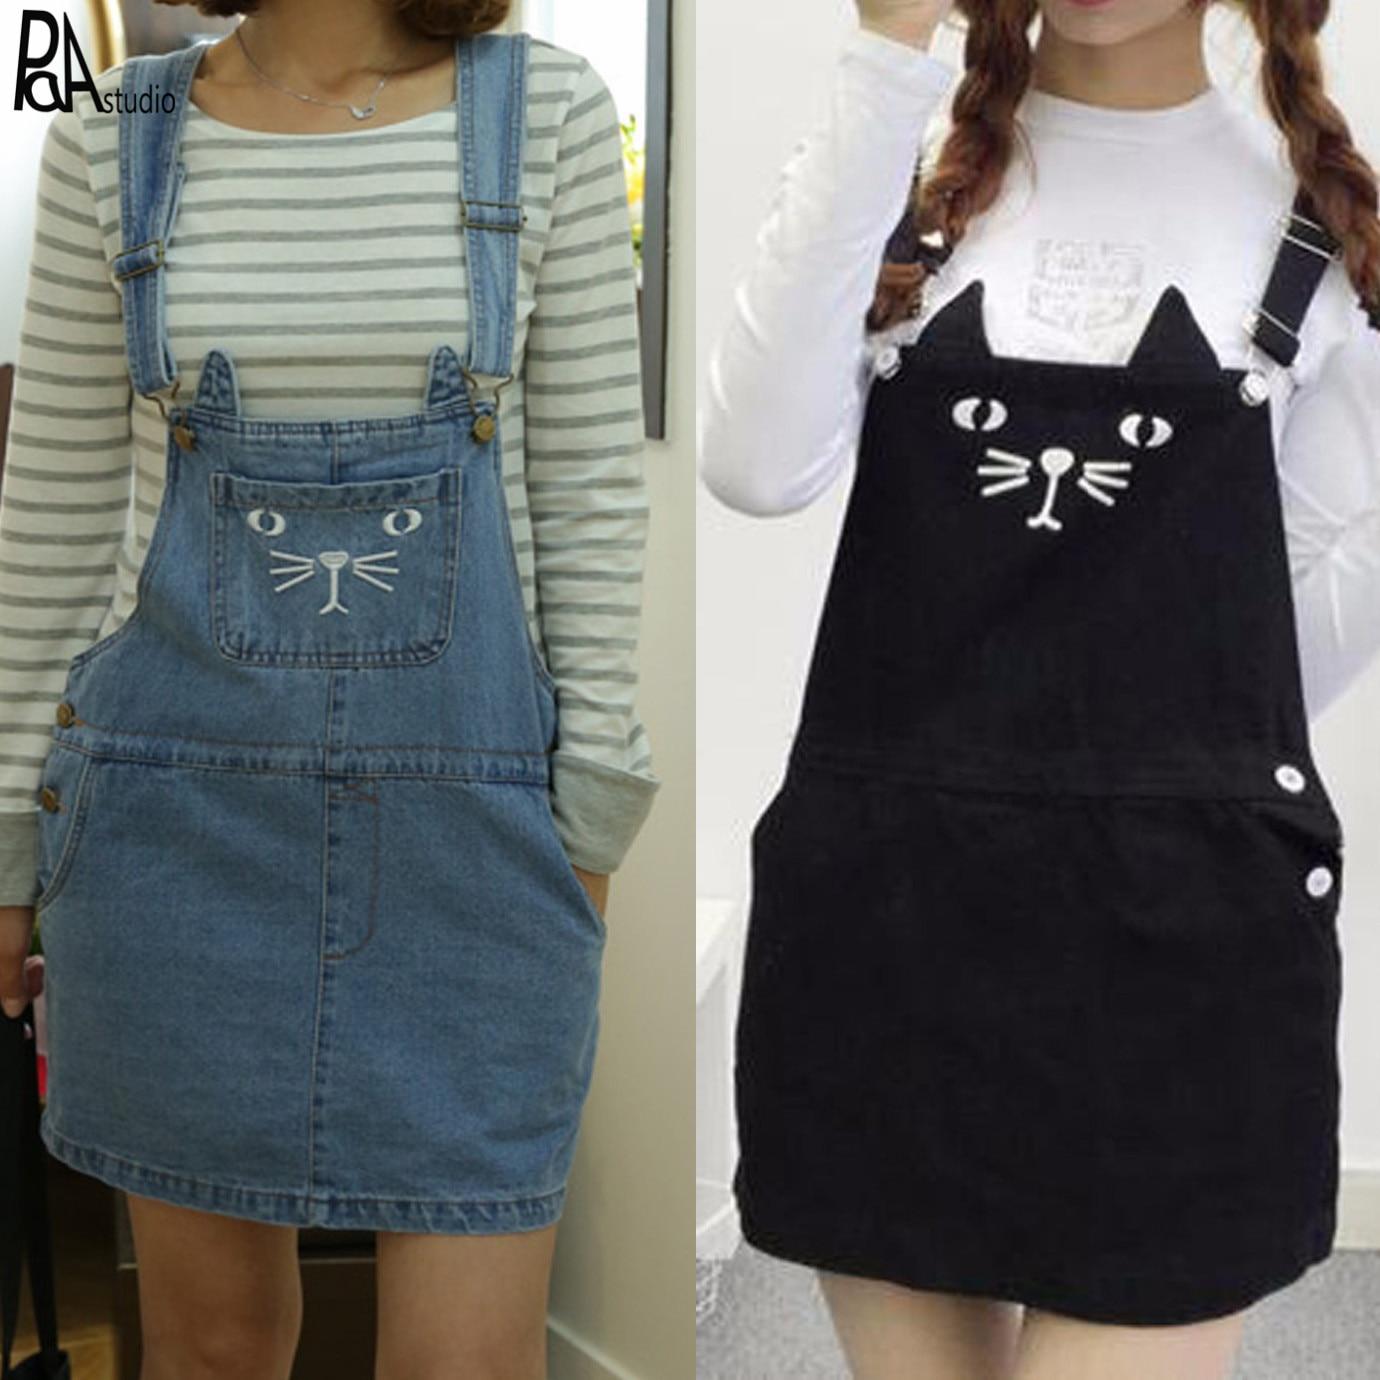 9794bd6db8 Lolita Soft Girl Kawaii Cartoon Embroidery Cat Bear Print Buckle Adjust  Strap Overall Denim Dress Plus Size Suspender Saias 4XL-in Dresses from  Women s ...